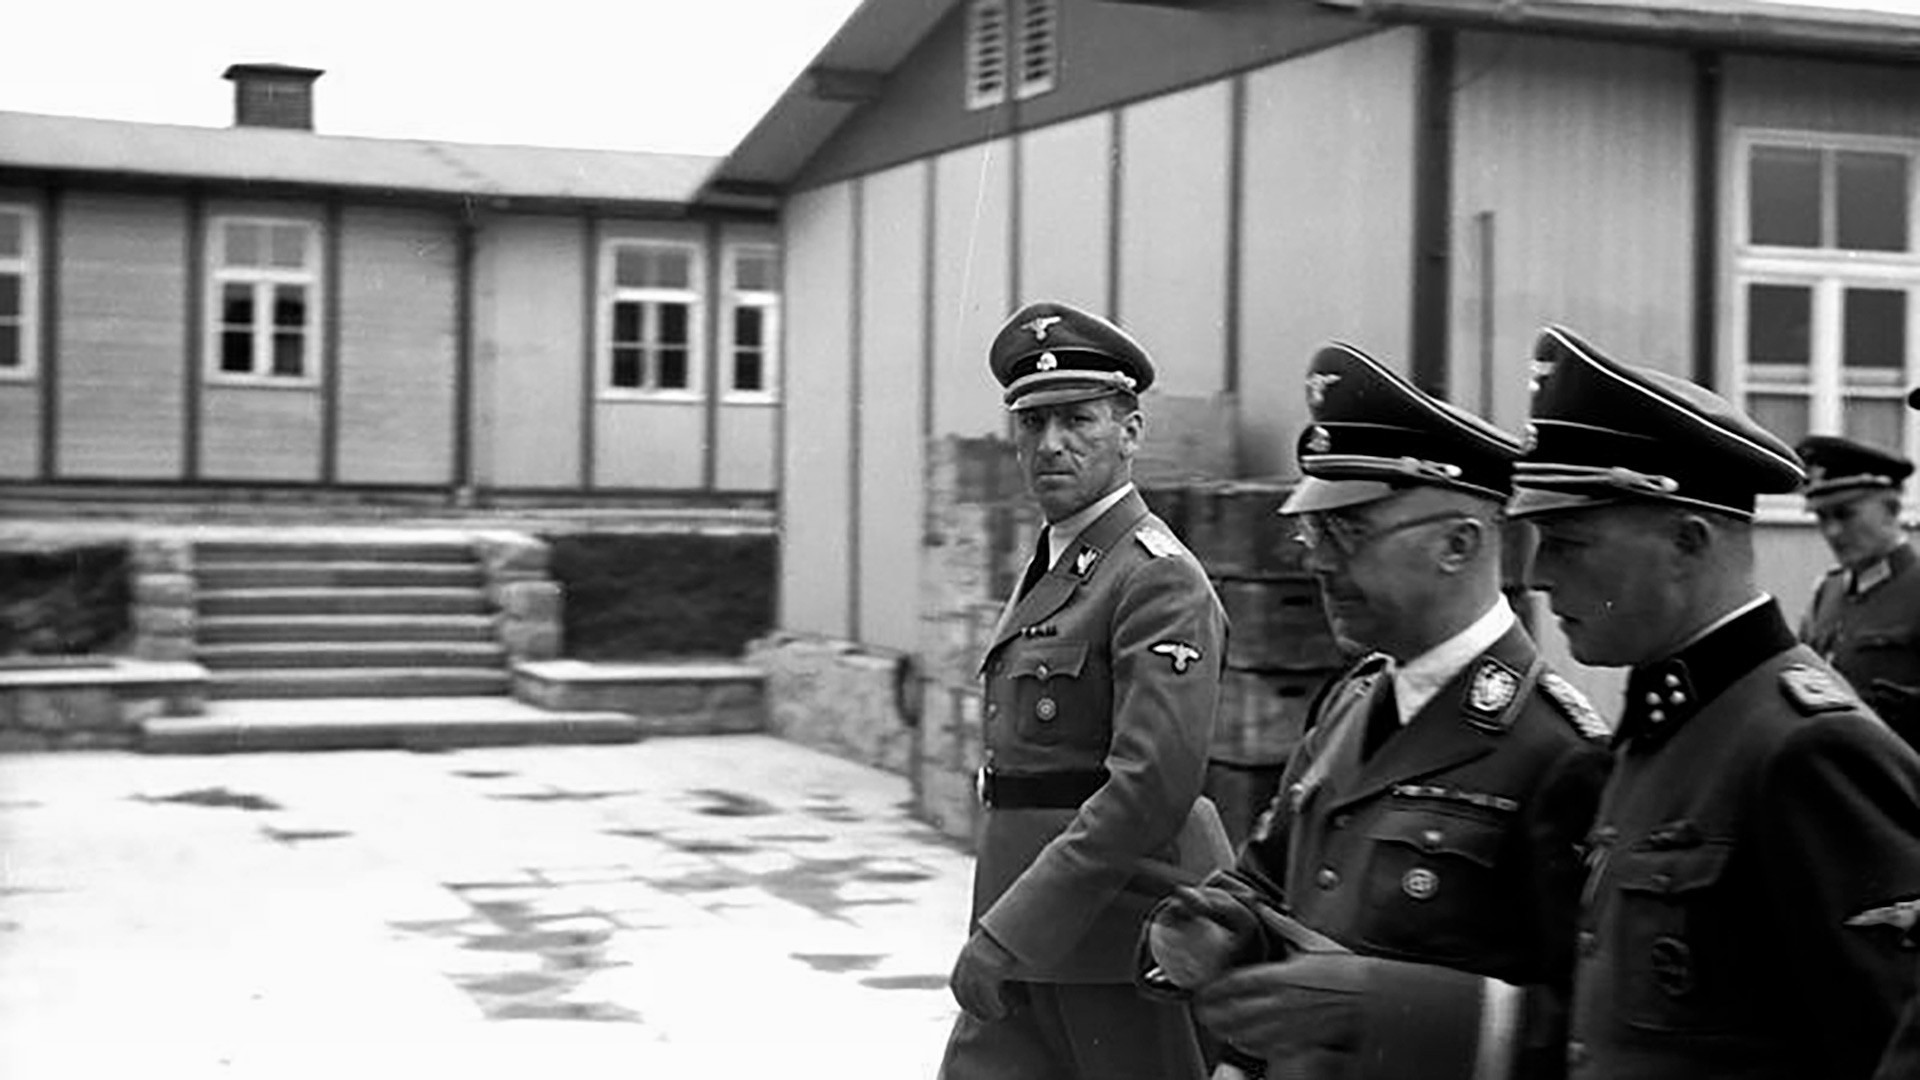 Koncentracijski logor Mauthausen. Himmler, Kaltenbrunner i Ziereis.